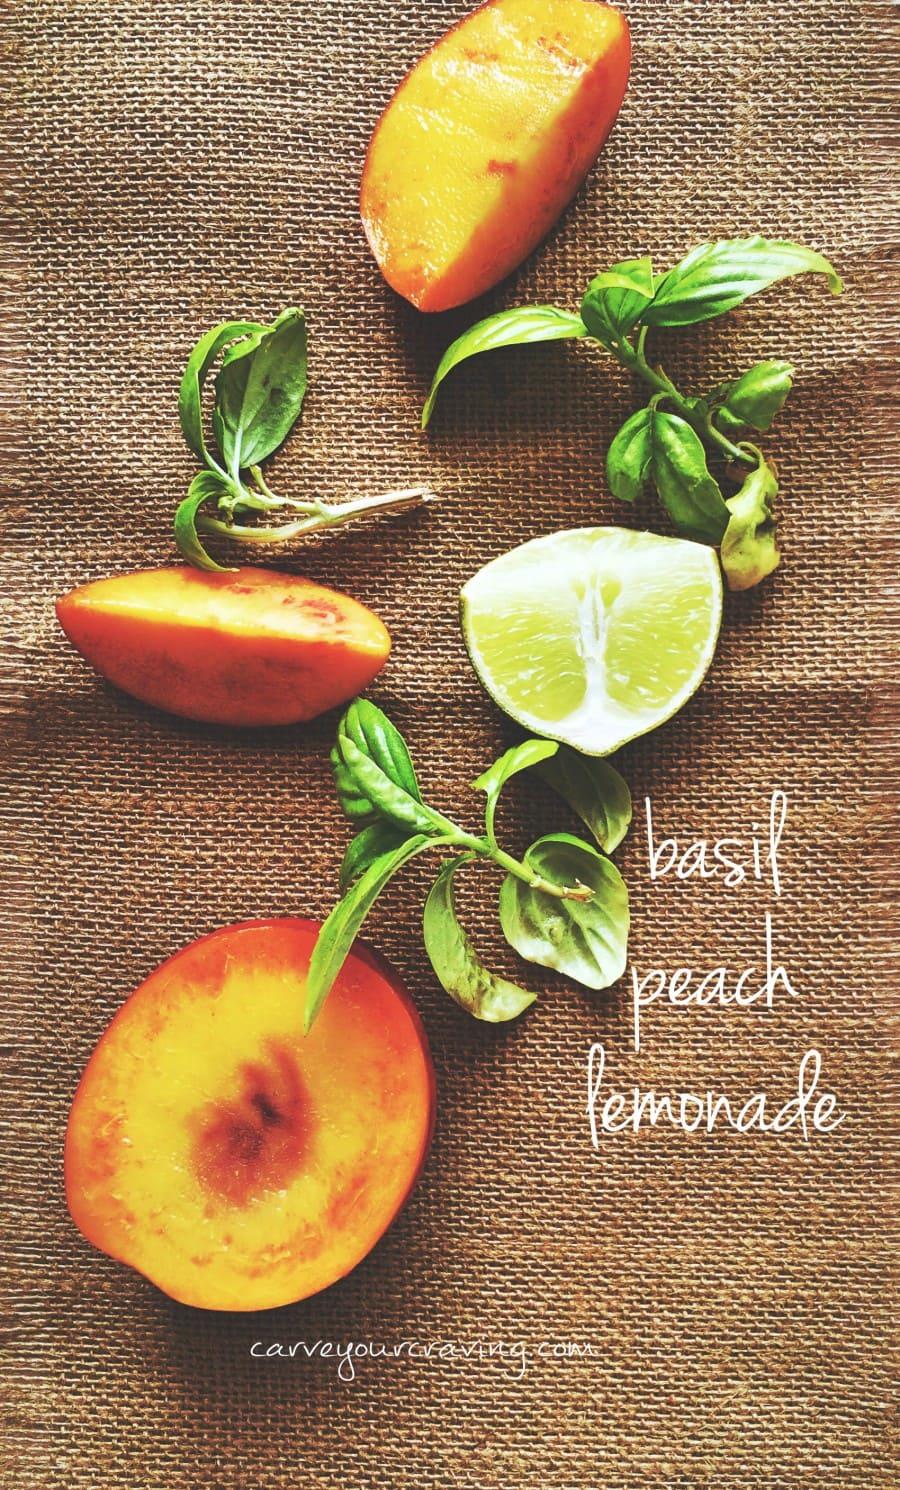 peaches and basil on hand so made basil peach lemonade